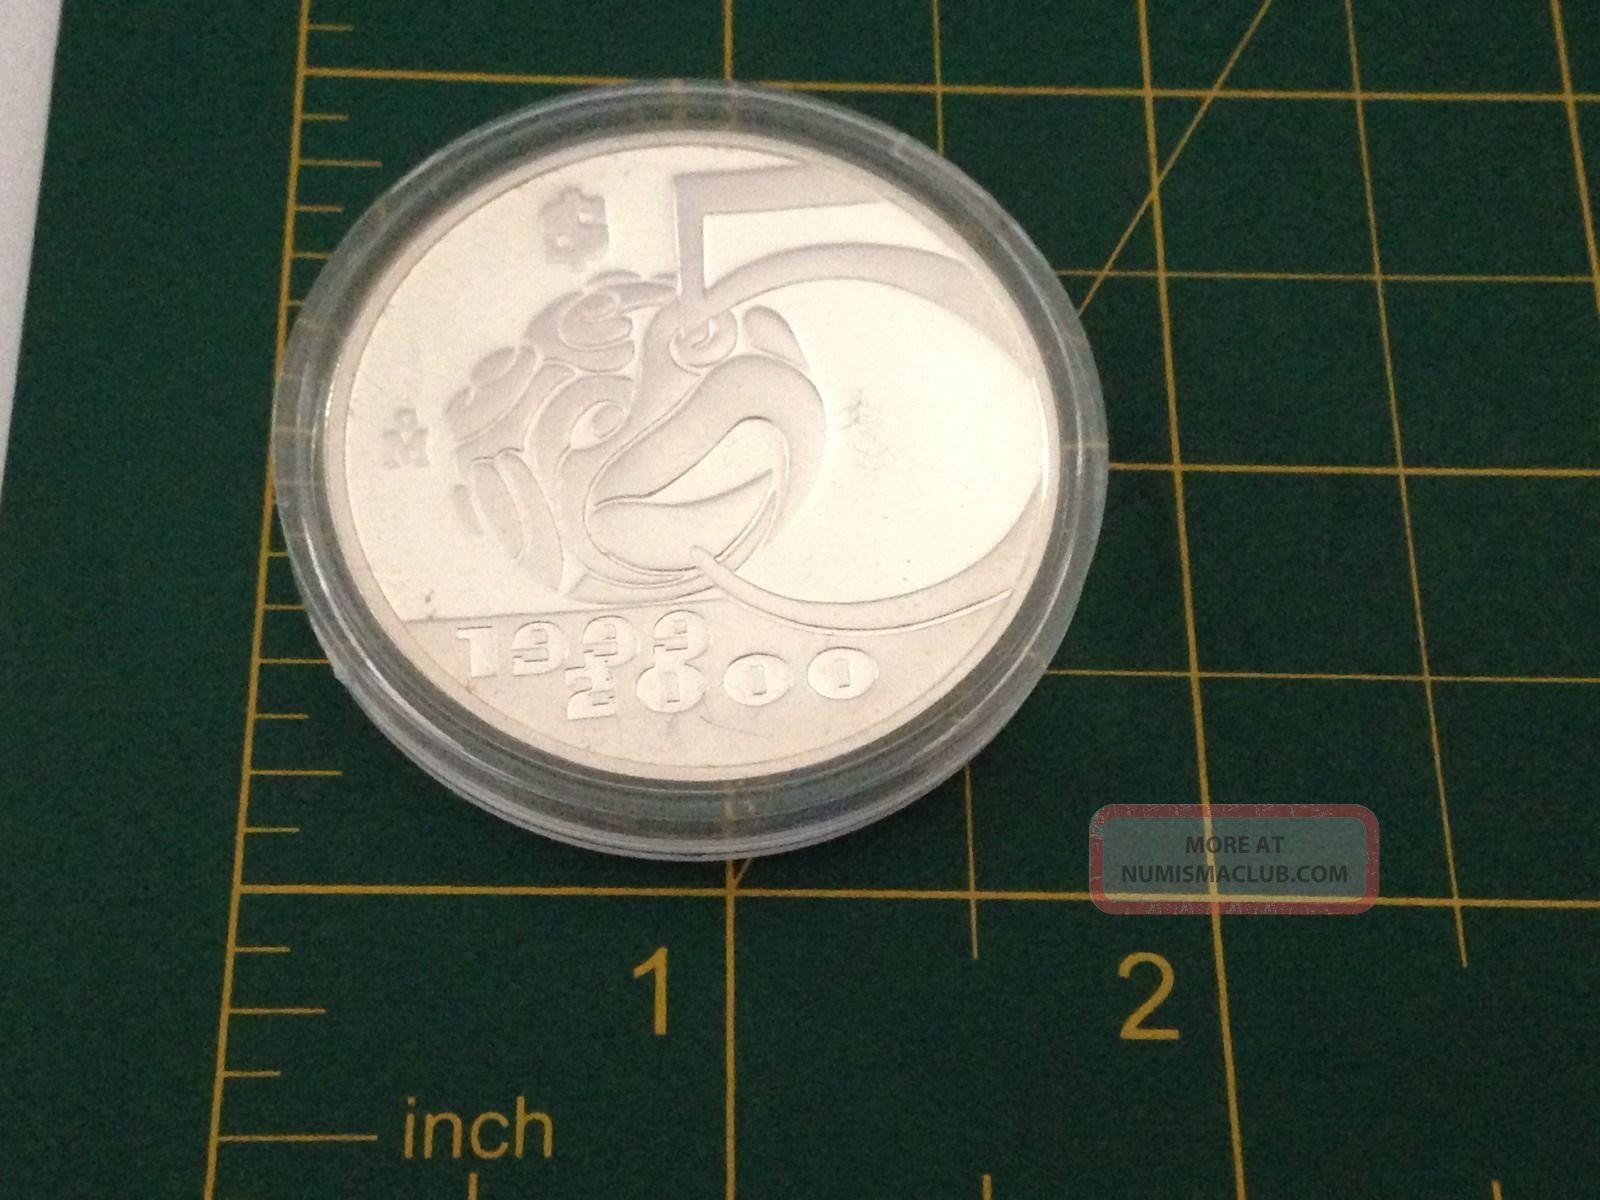 Mexico Silver 5 Pesos 1oz Millennium Series 1999 2000